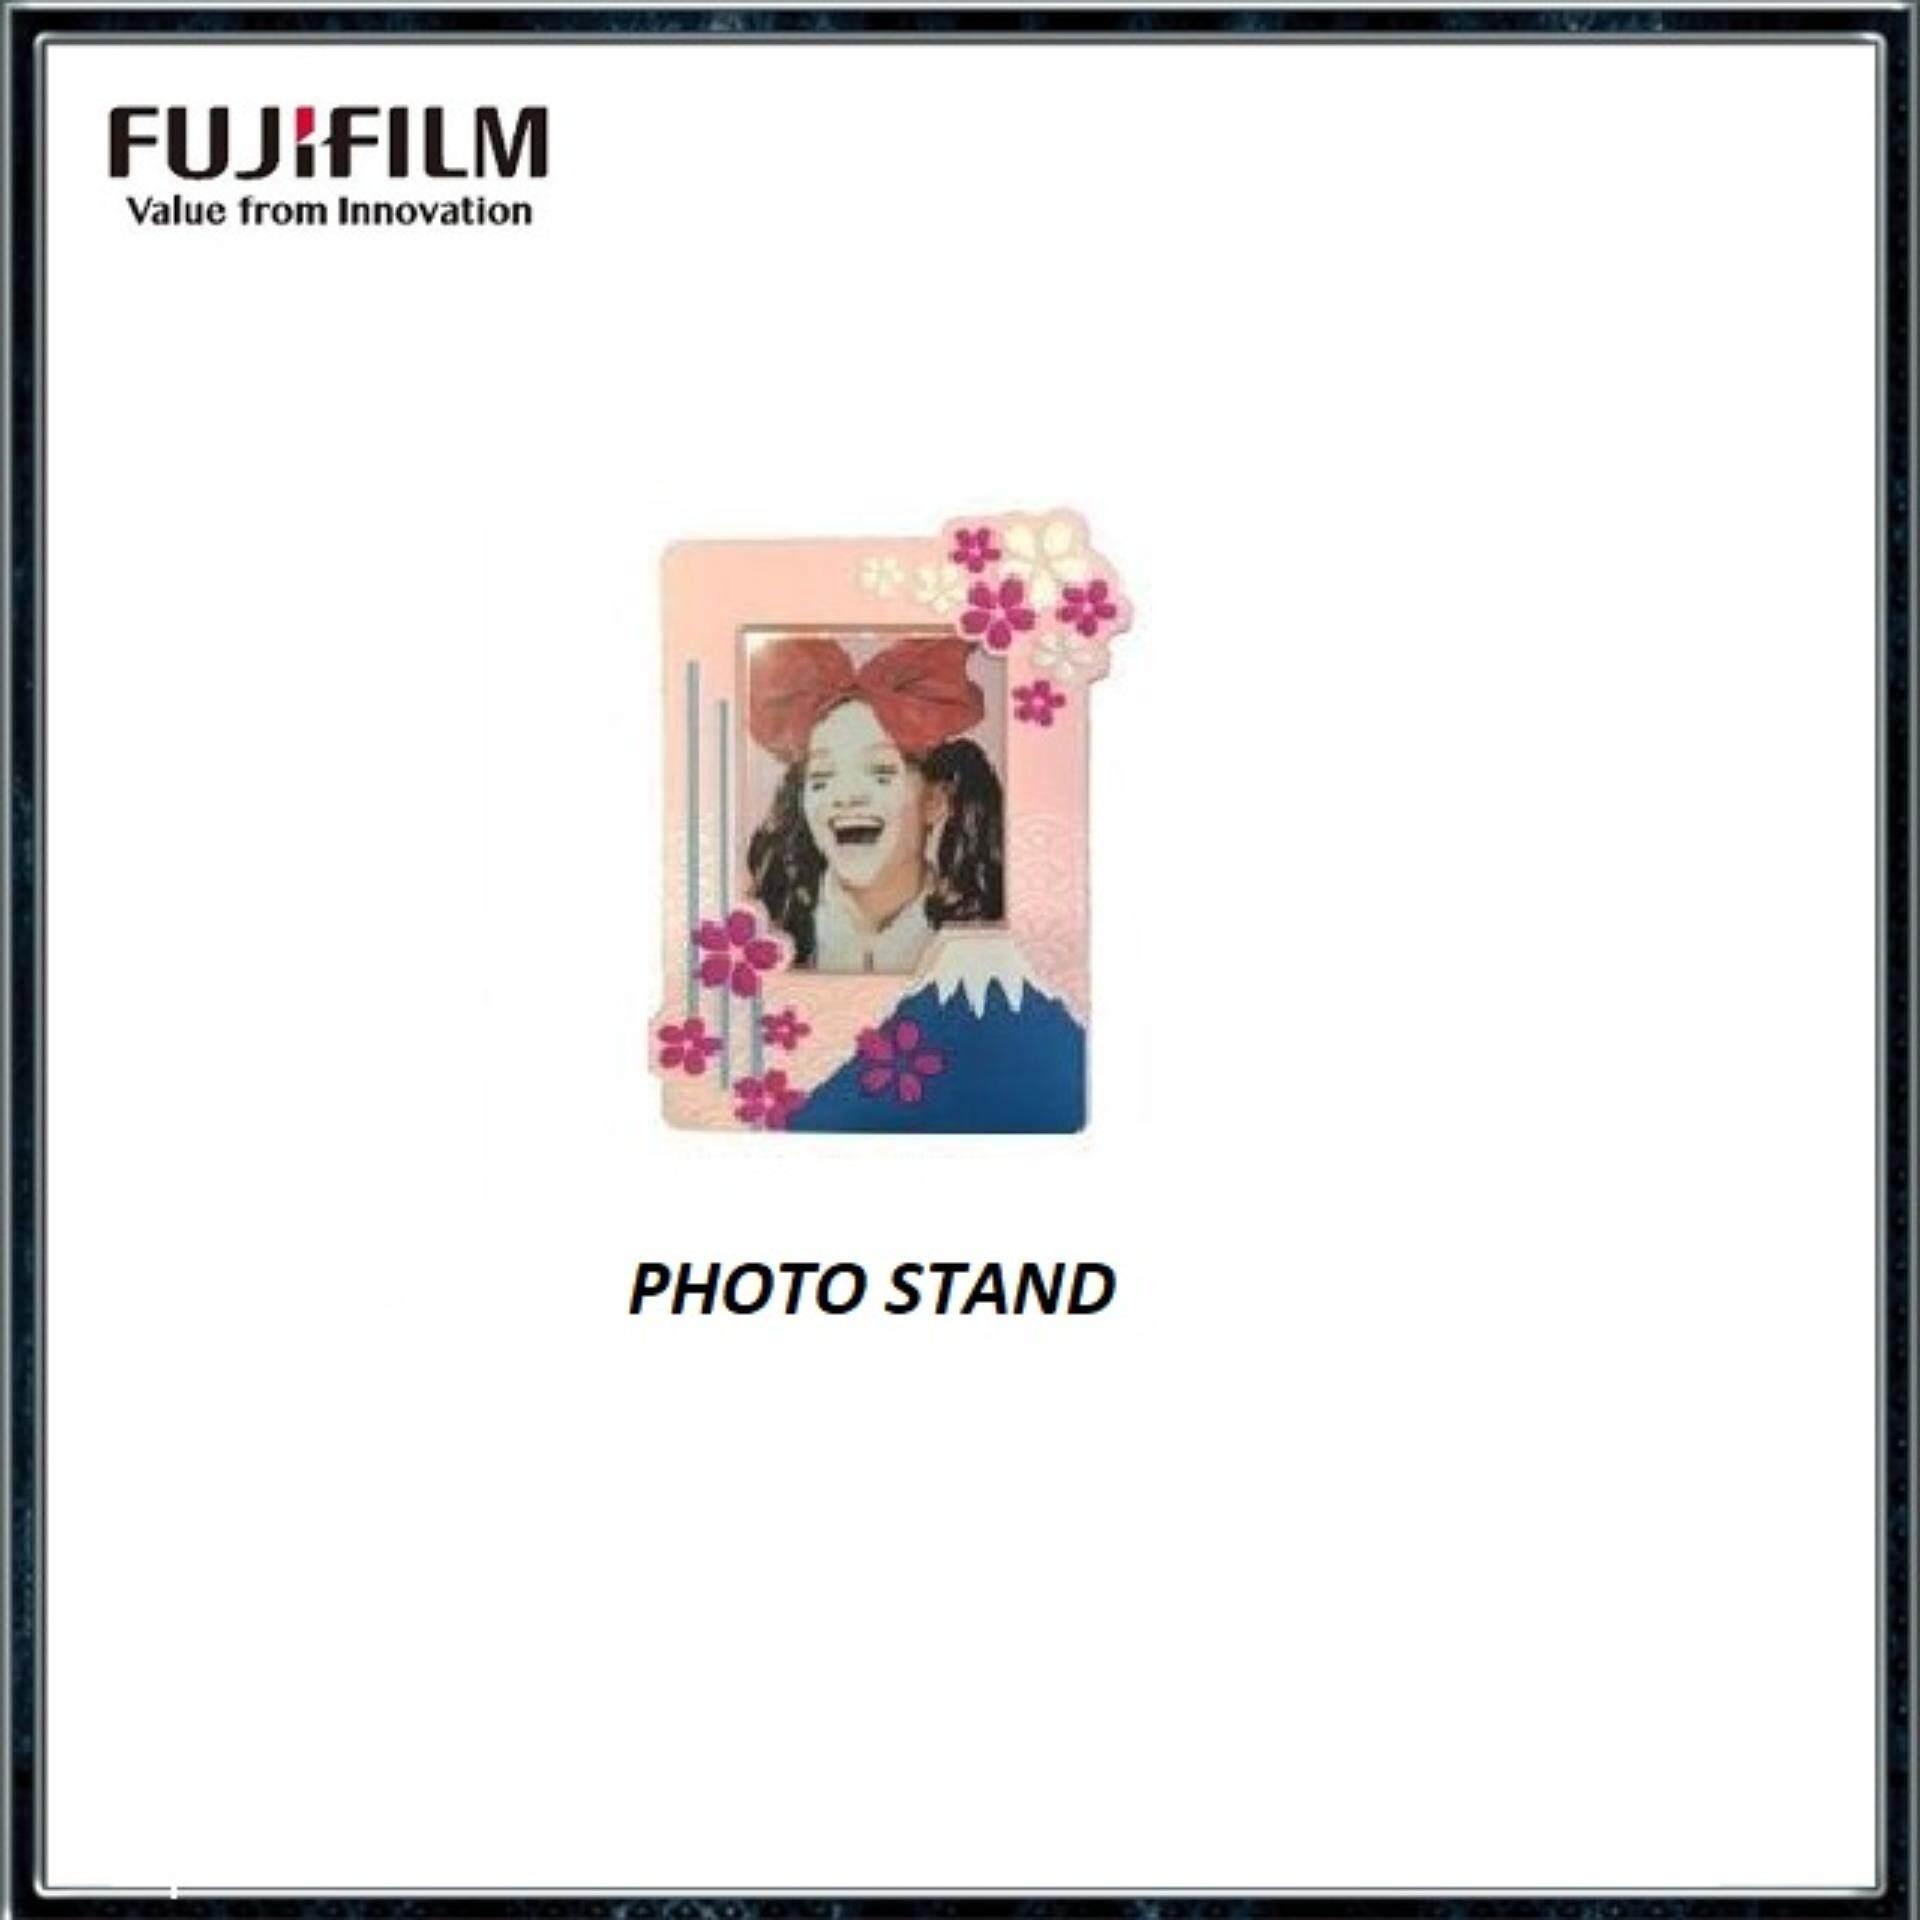 Fujifilm Sakura Photo Frame For Instax Film By Digital Solutions.